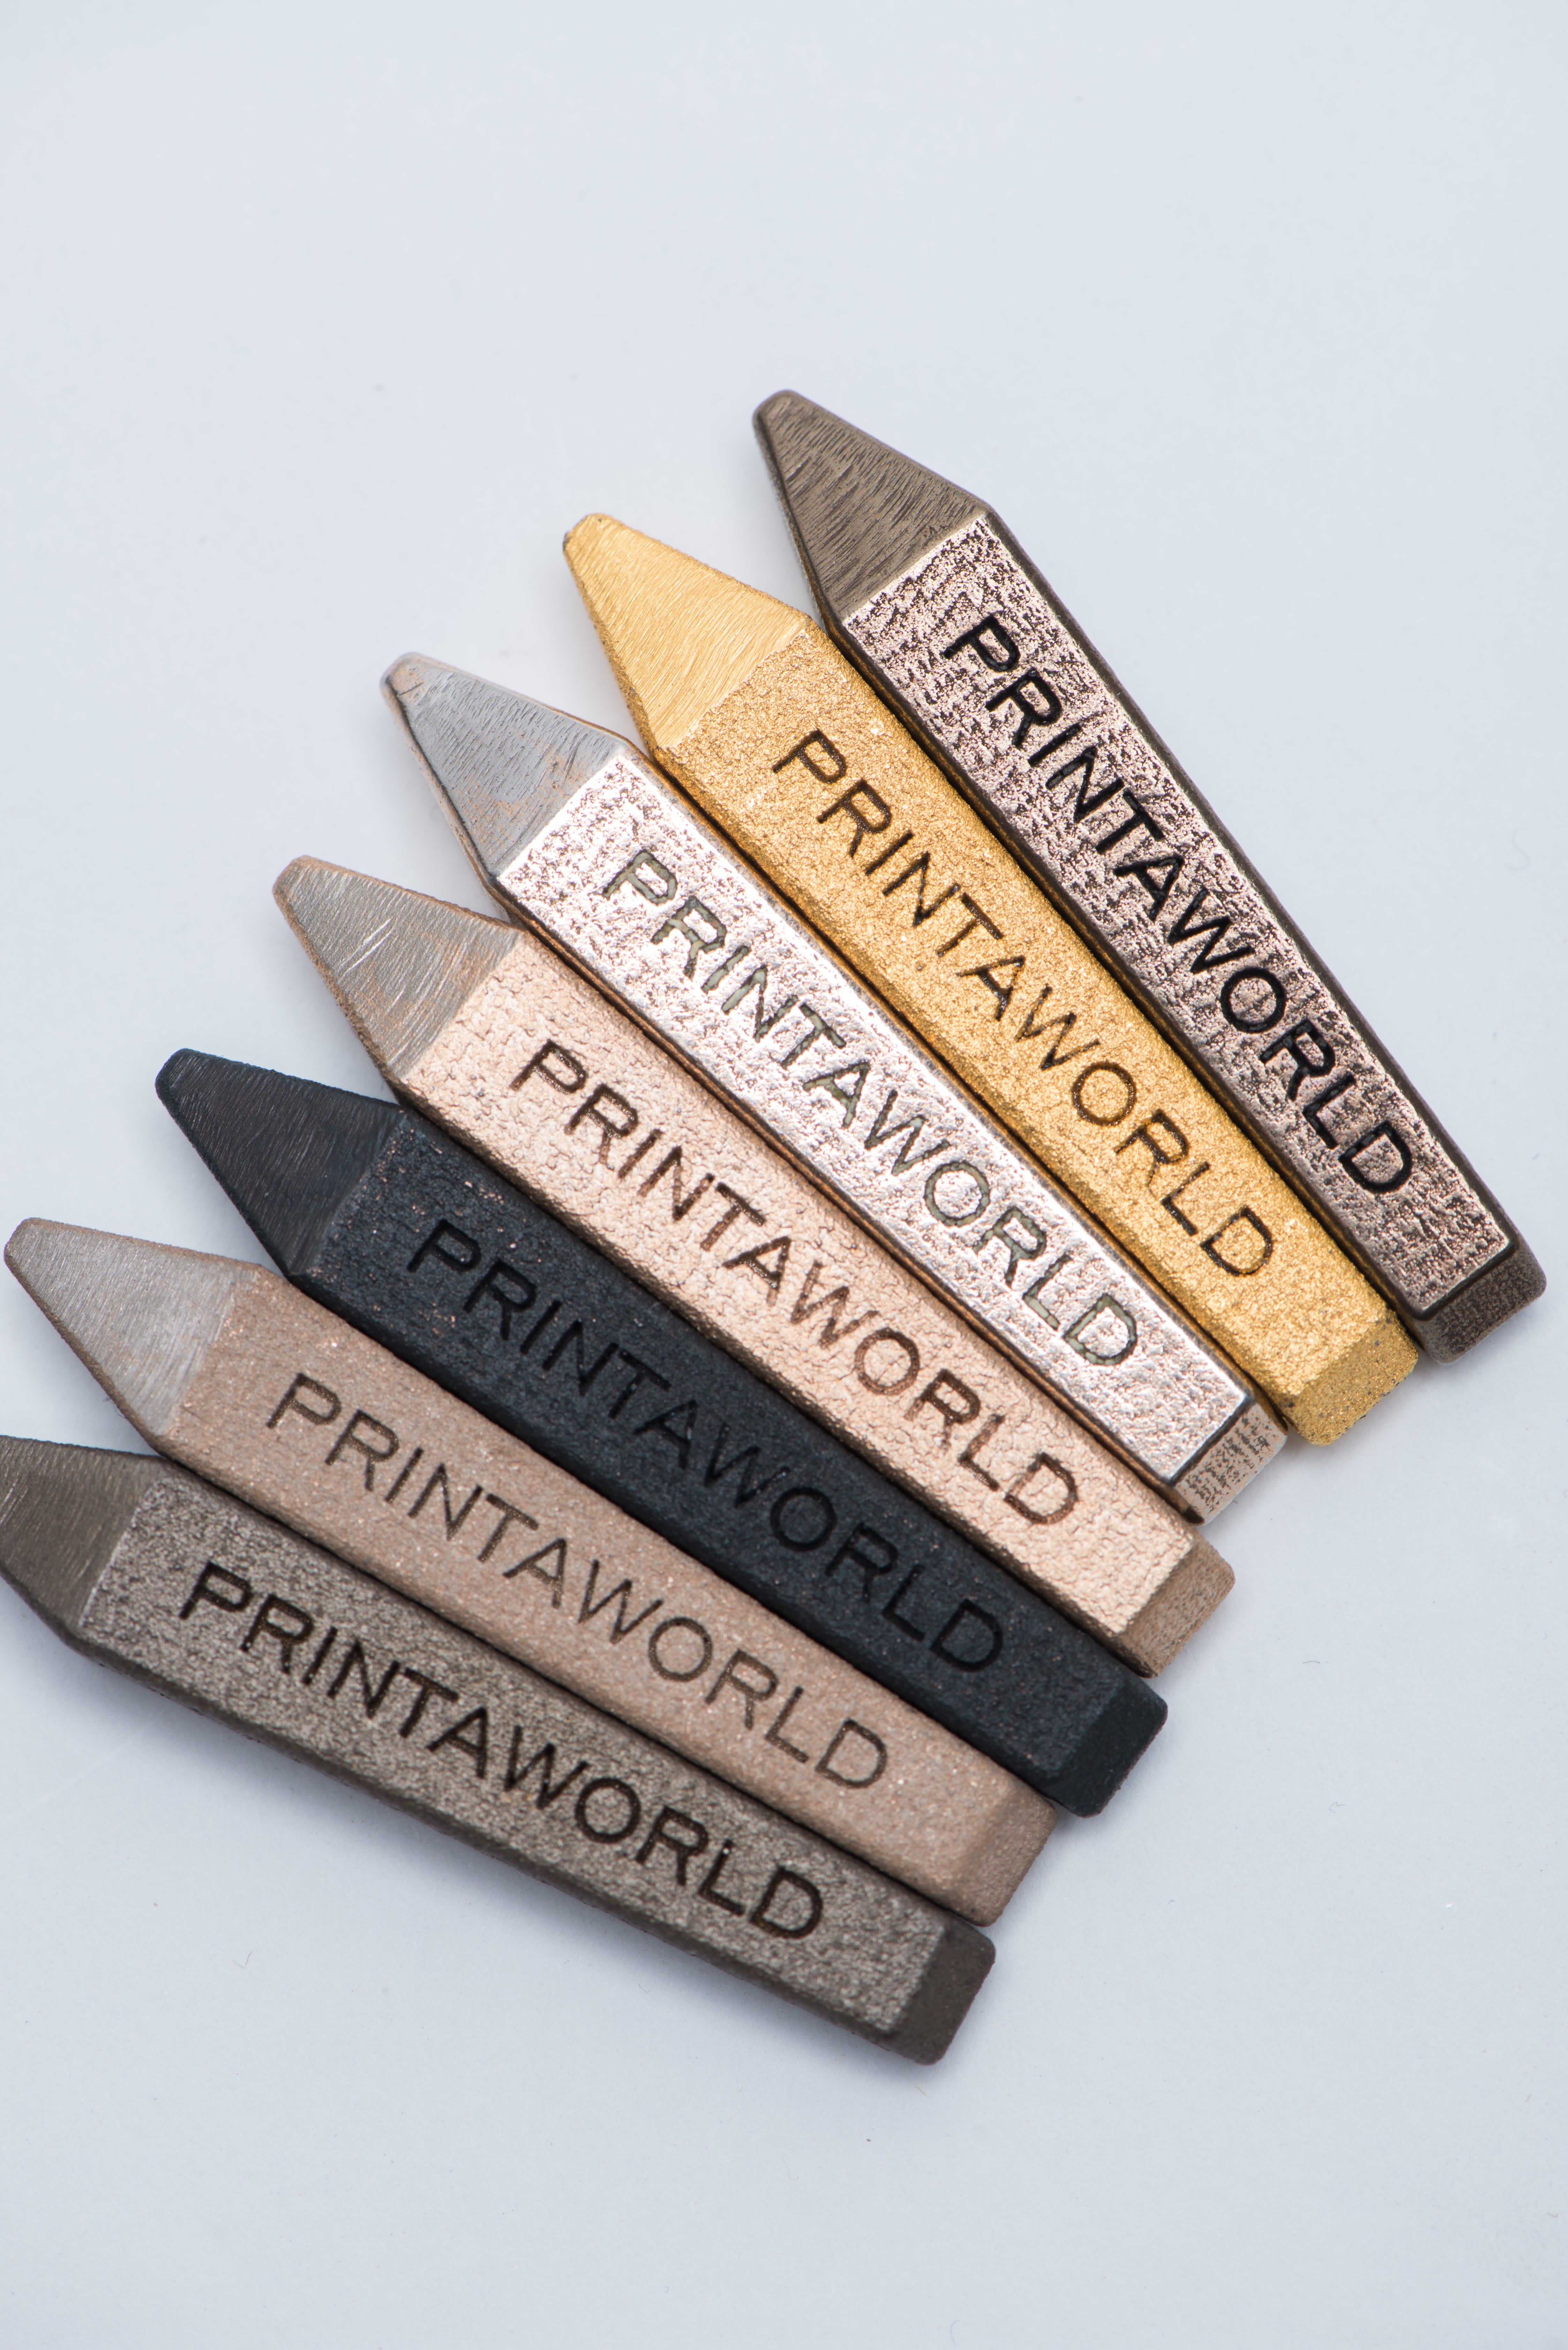 Laser Cut PrintAWorld Pens